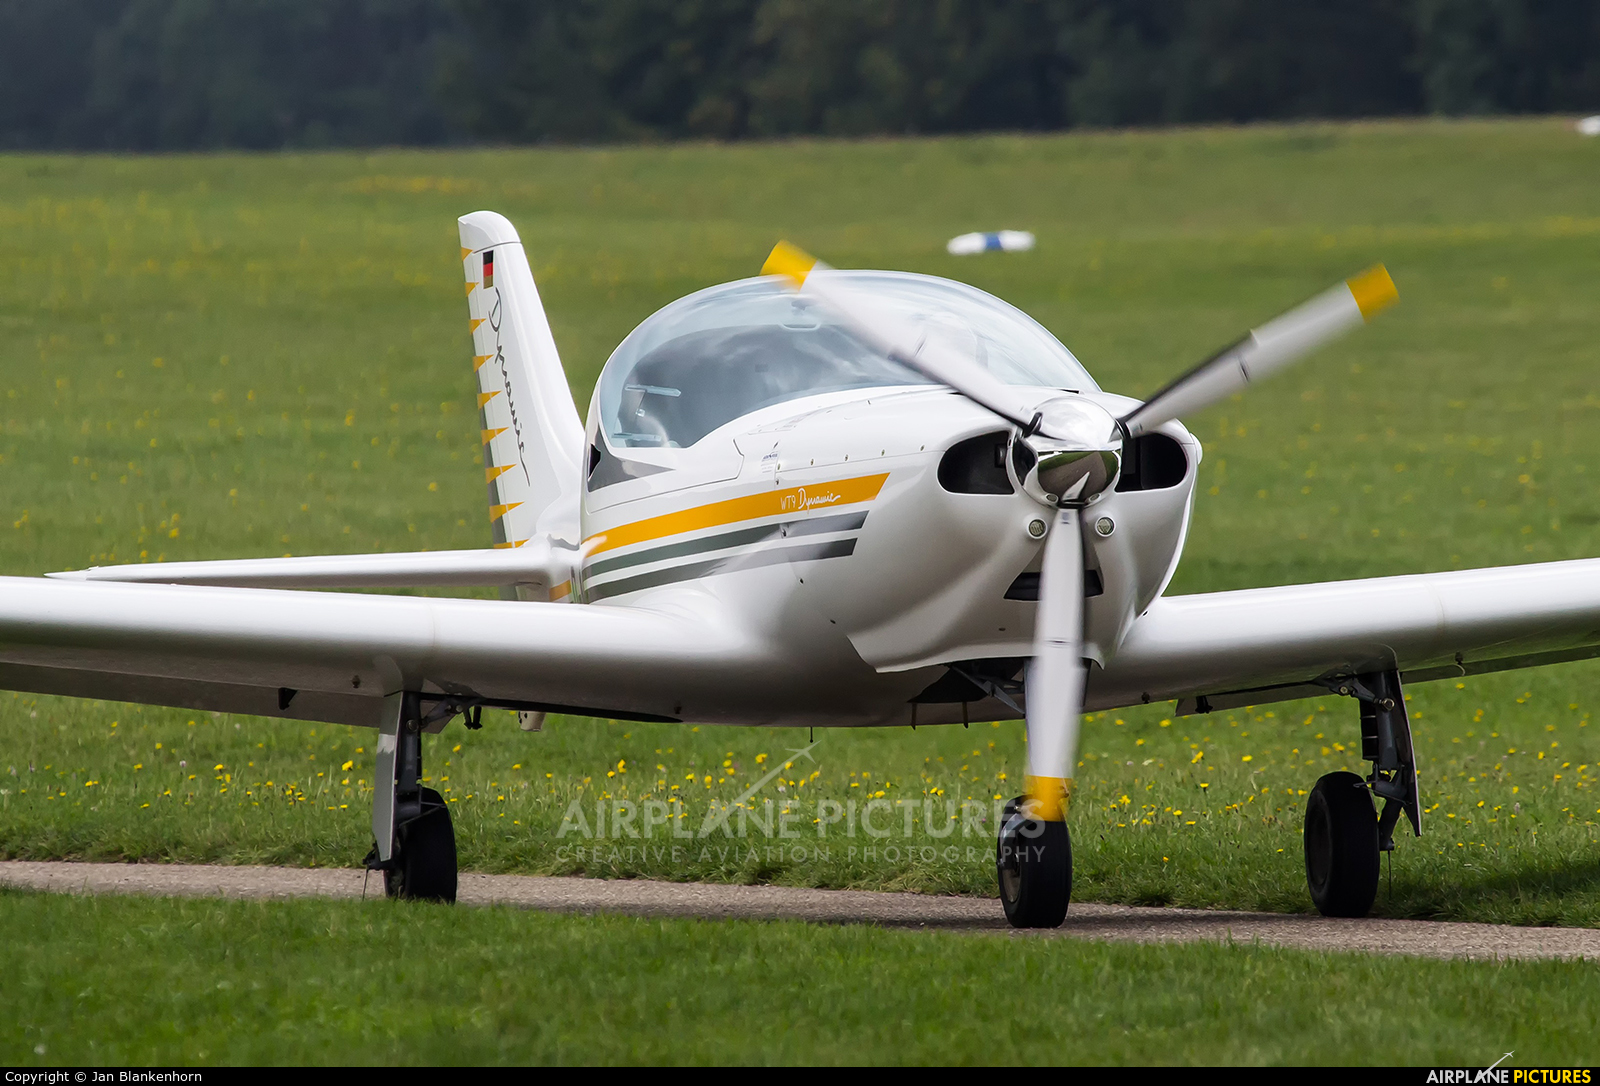 D-MLGE - Aerospool Aerospol WT9 Dynamic at Off Airport ...